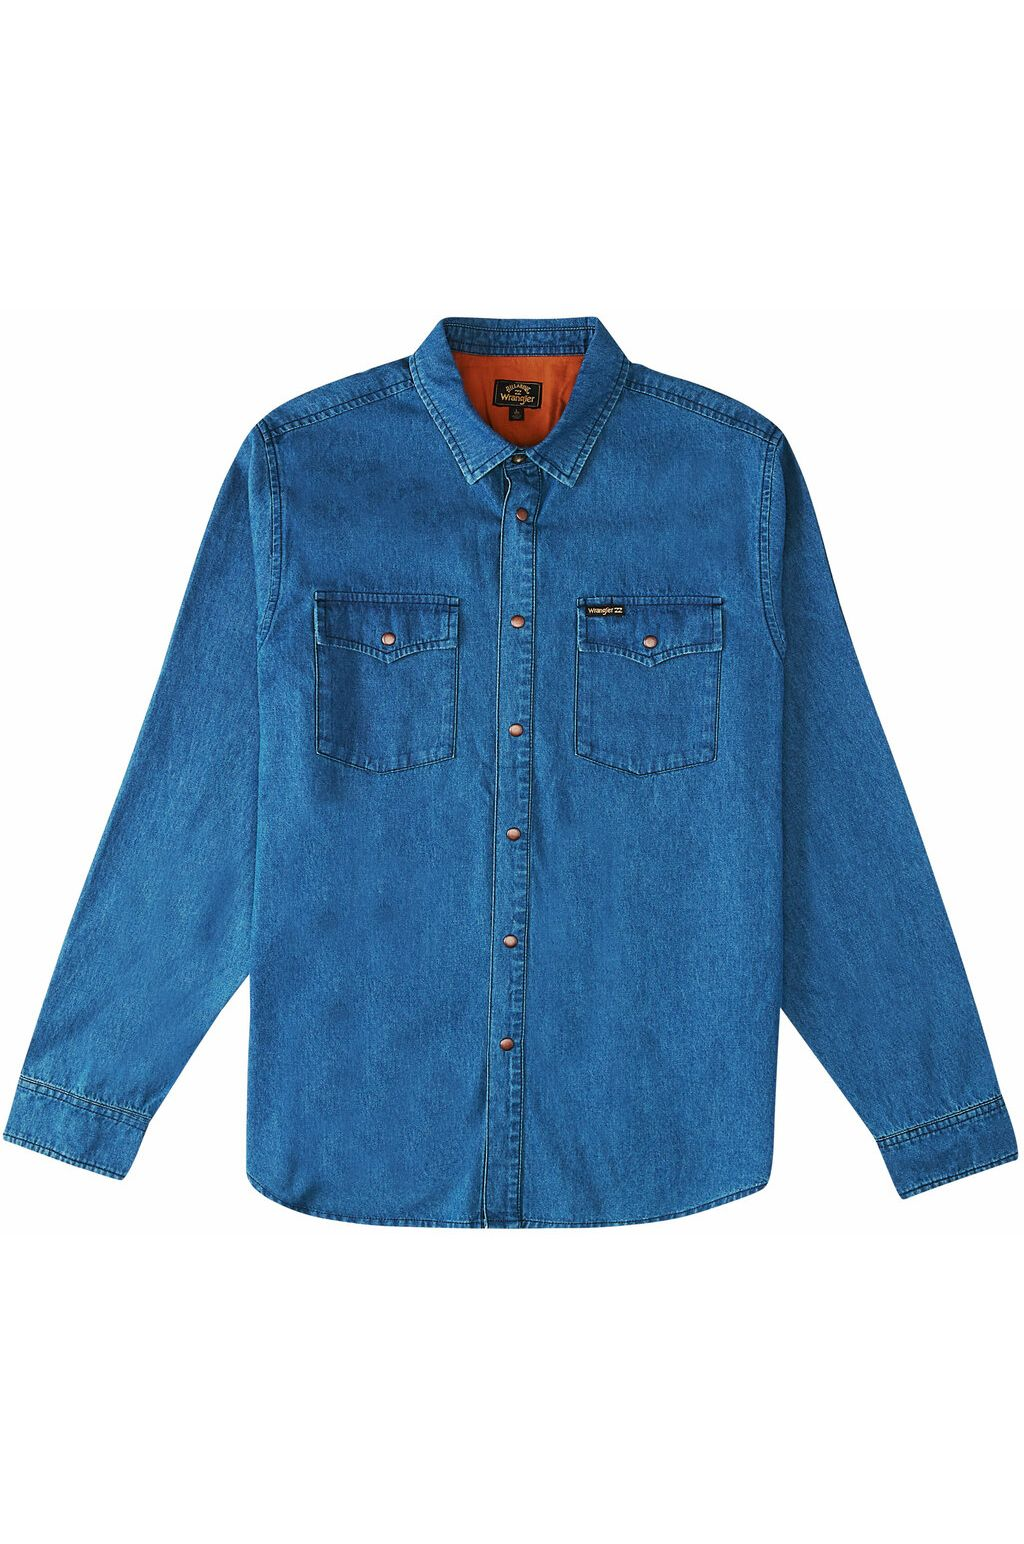 Billabong Shirt MORGAN DENIM LS WRANGLER. Ocean Blue